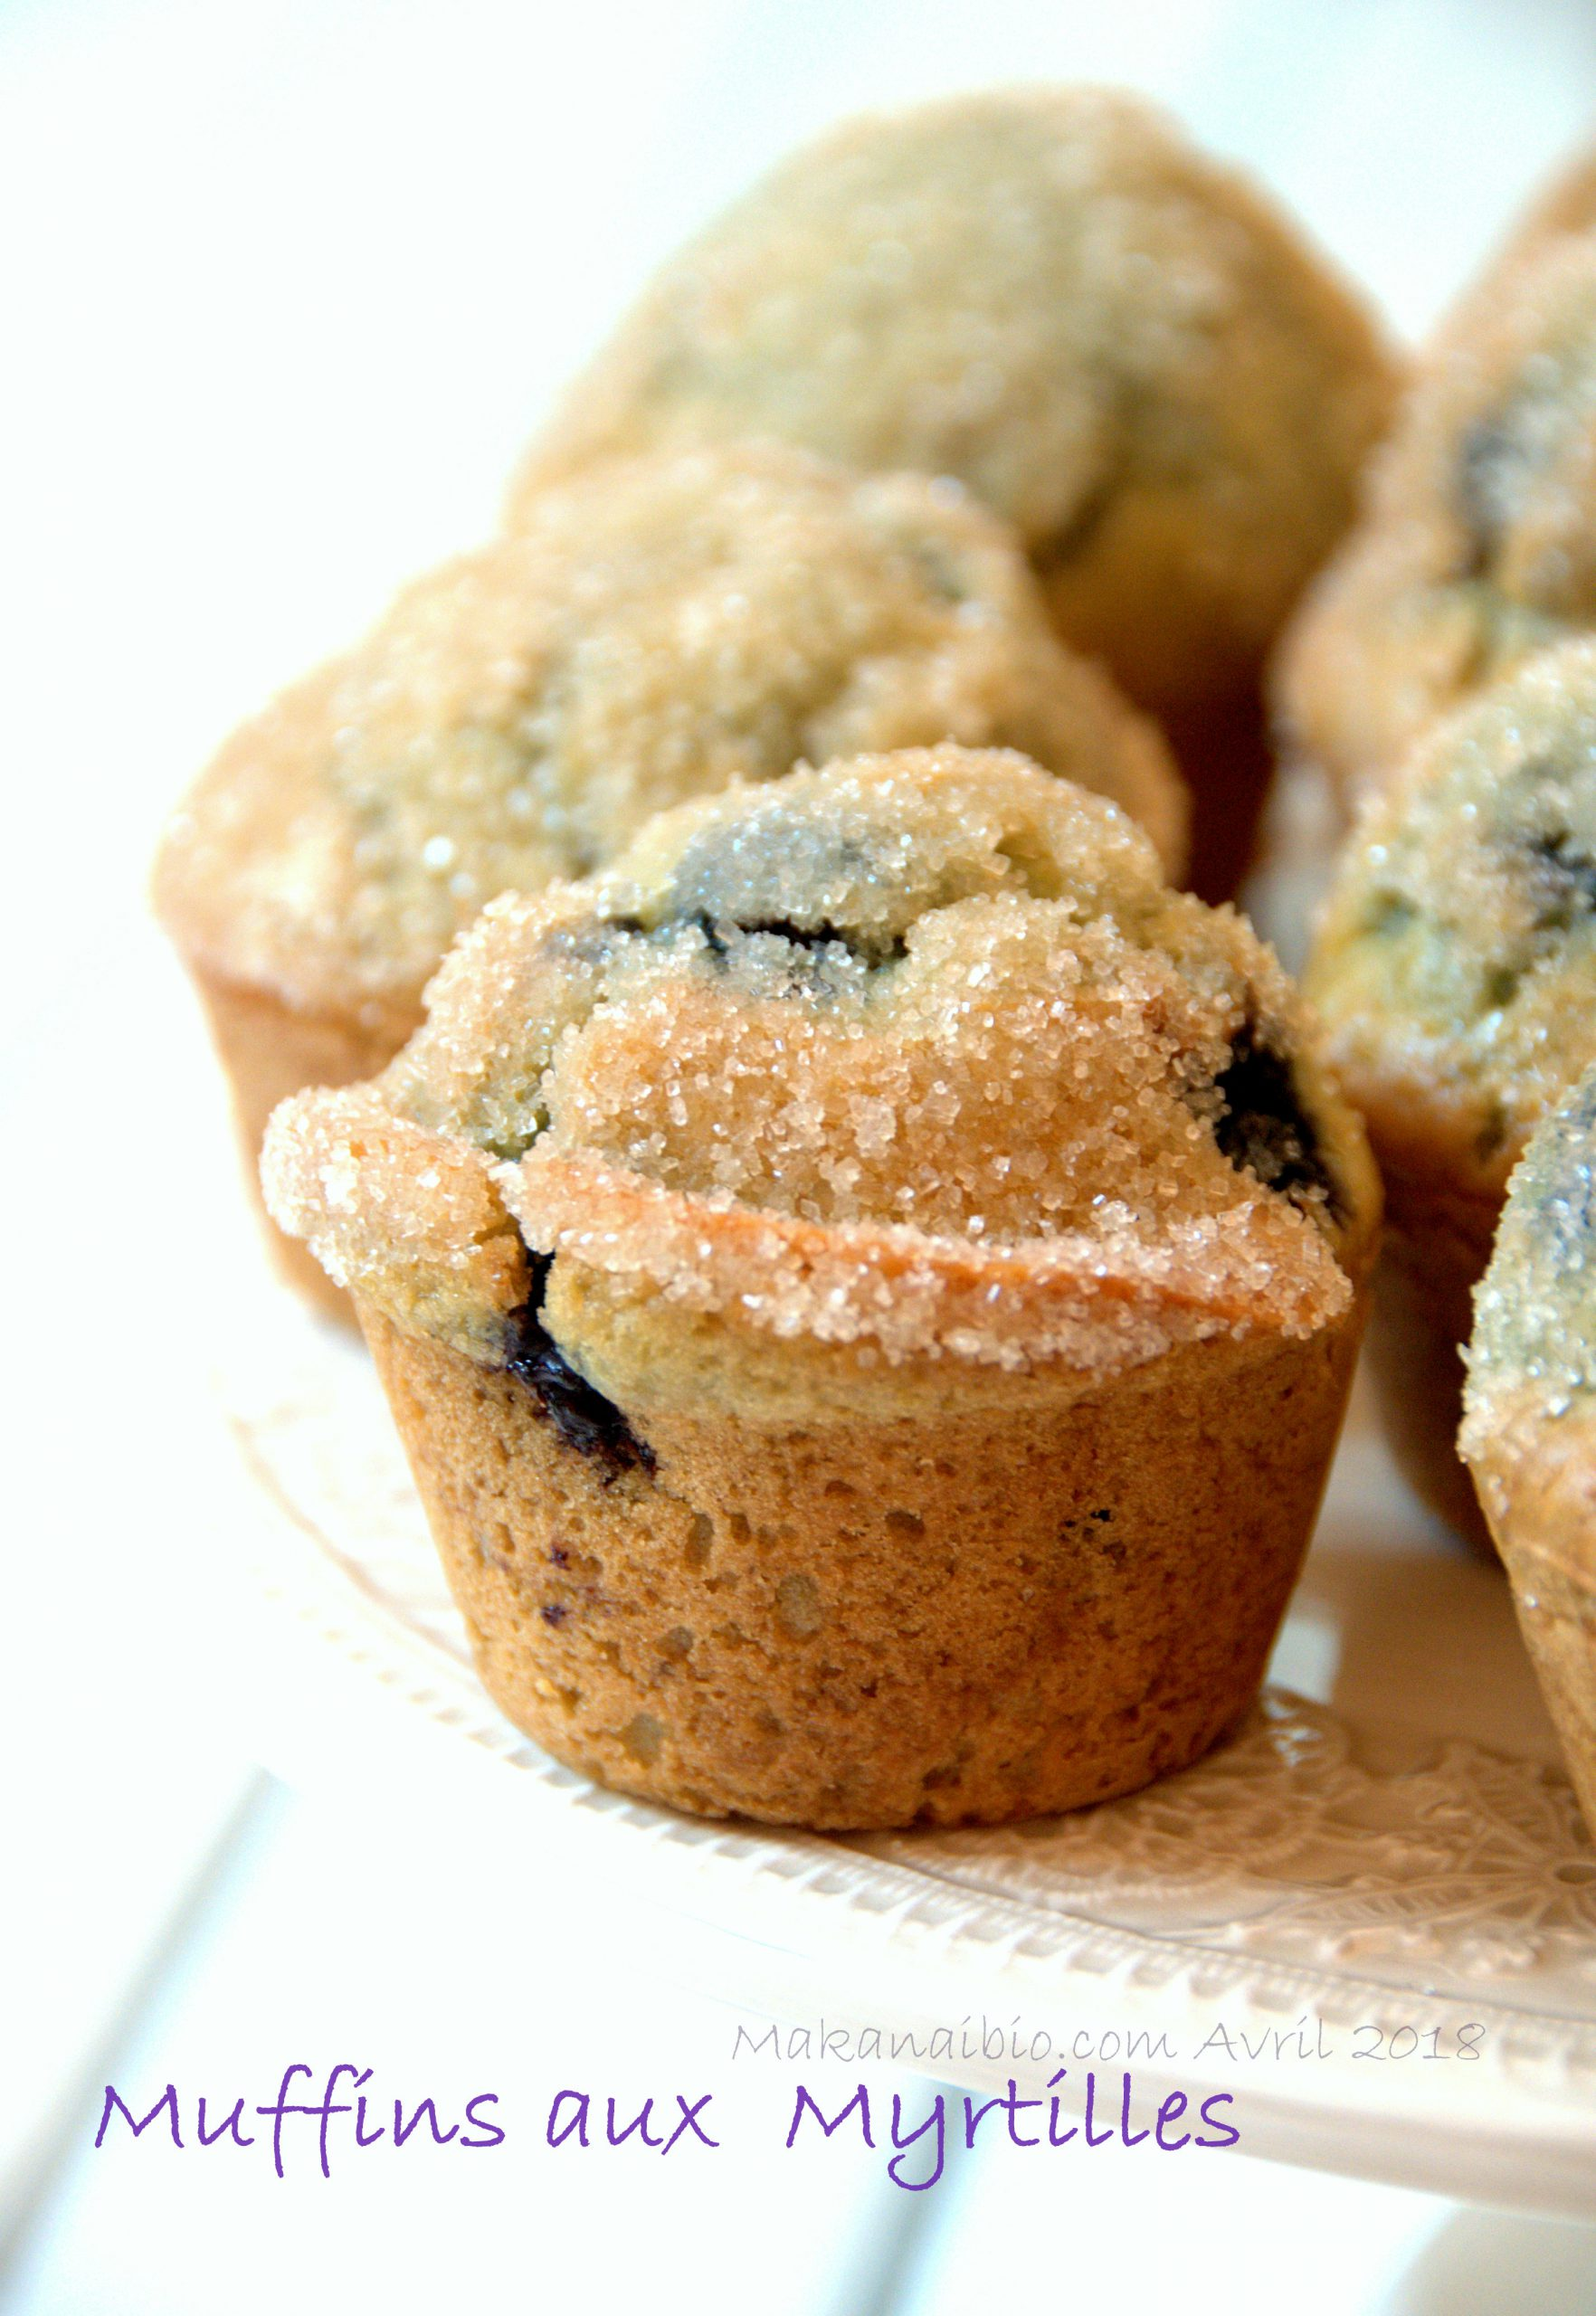 Muffins aux myrtilles @makanaibio.com 2018